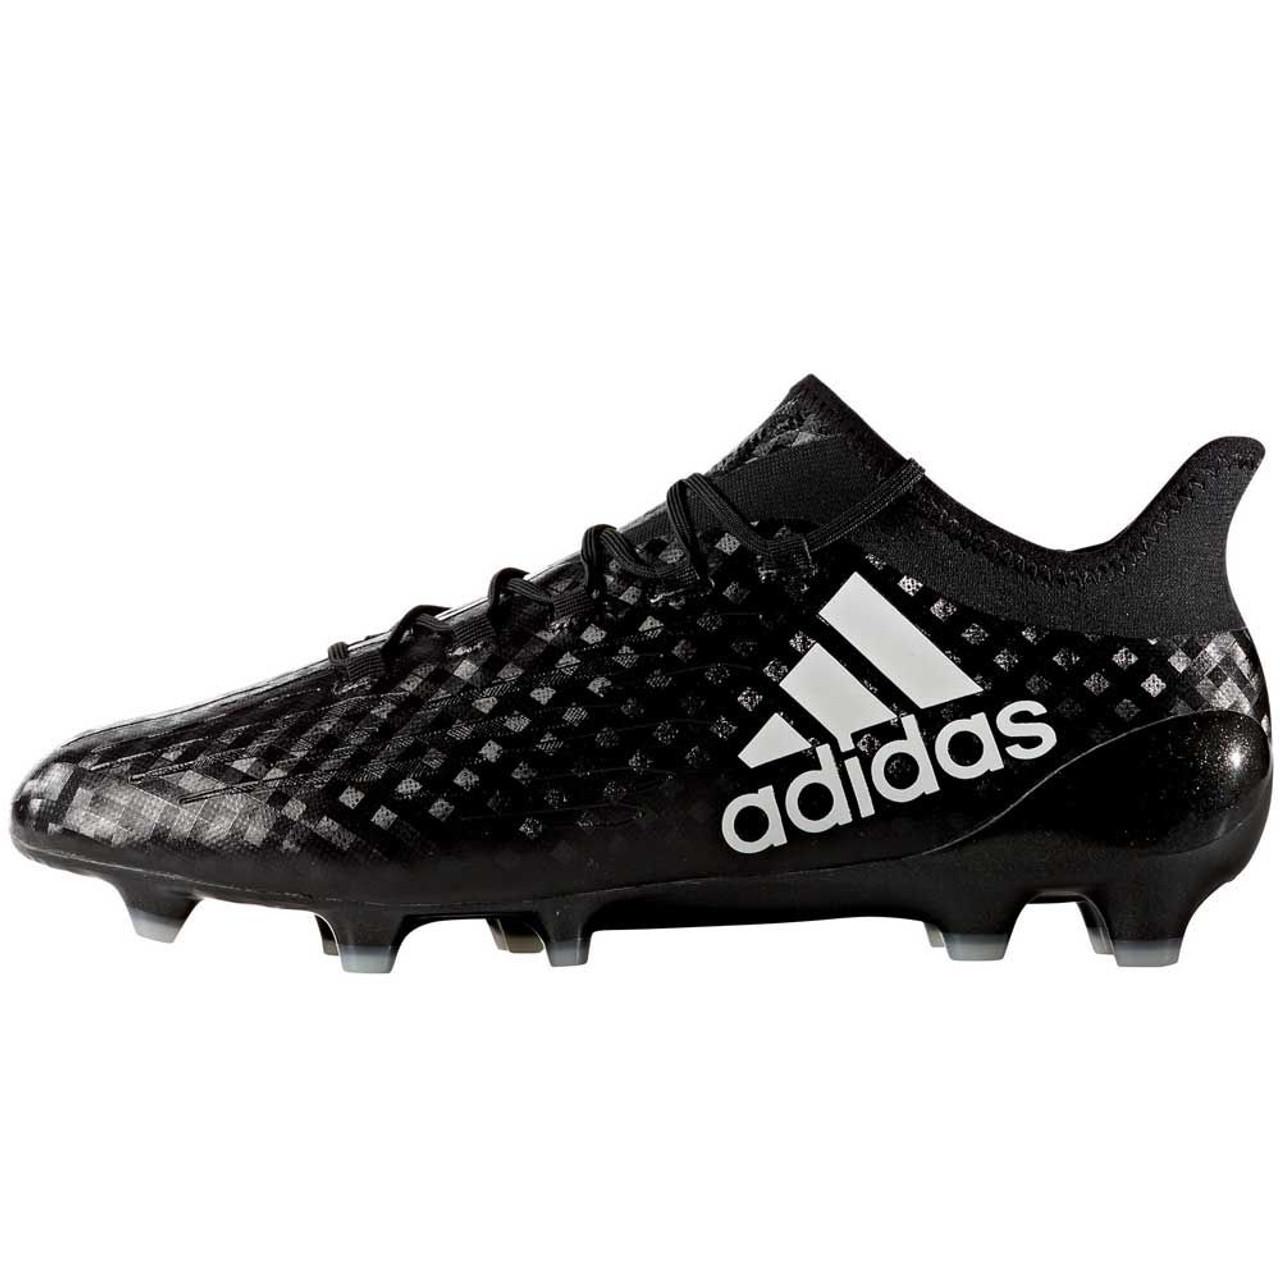 9de38cf8fc5 ADIDAS X 16.1 FG CORE BLACK GREY - Soccer Plus